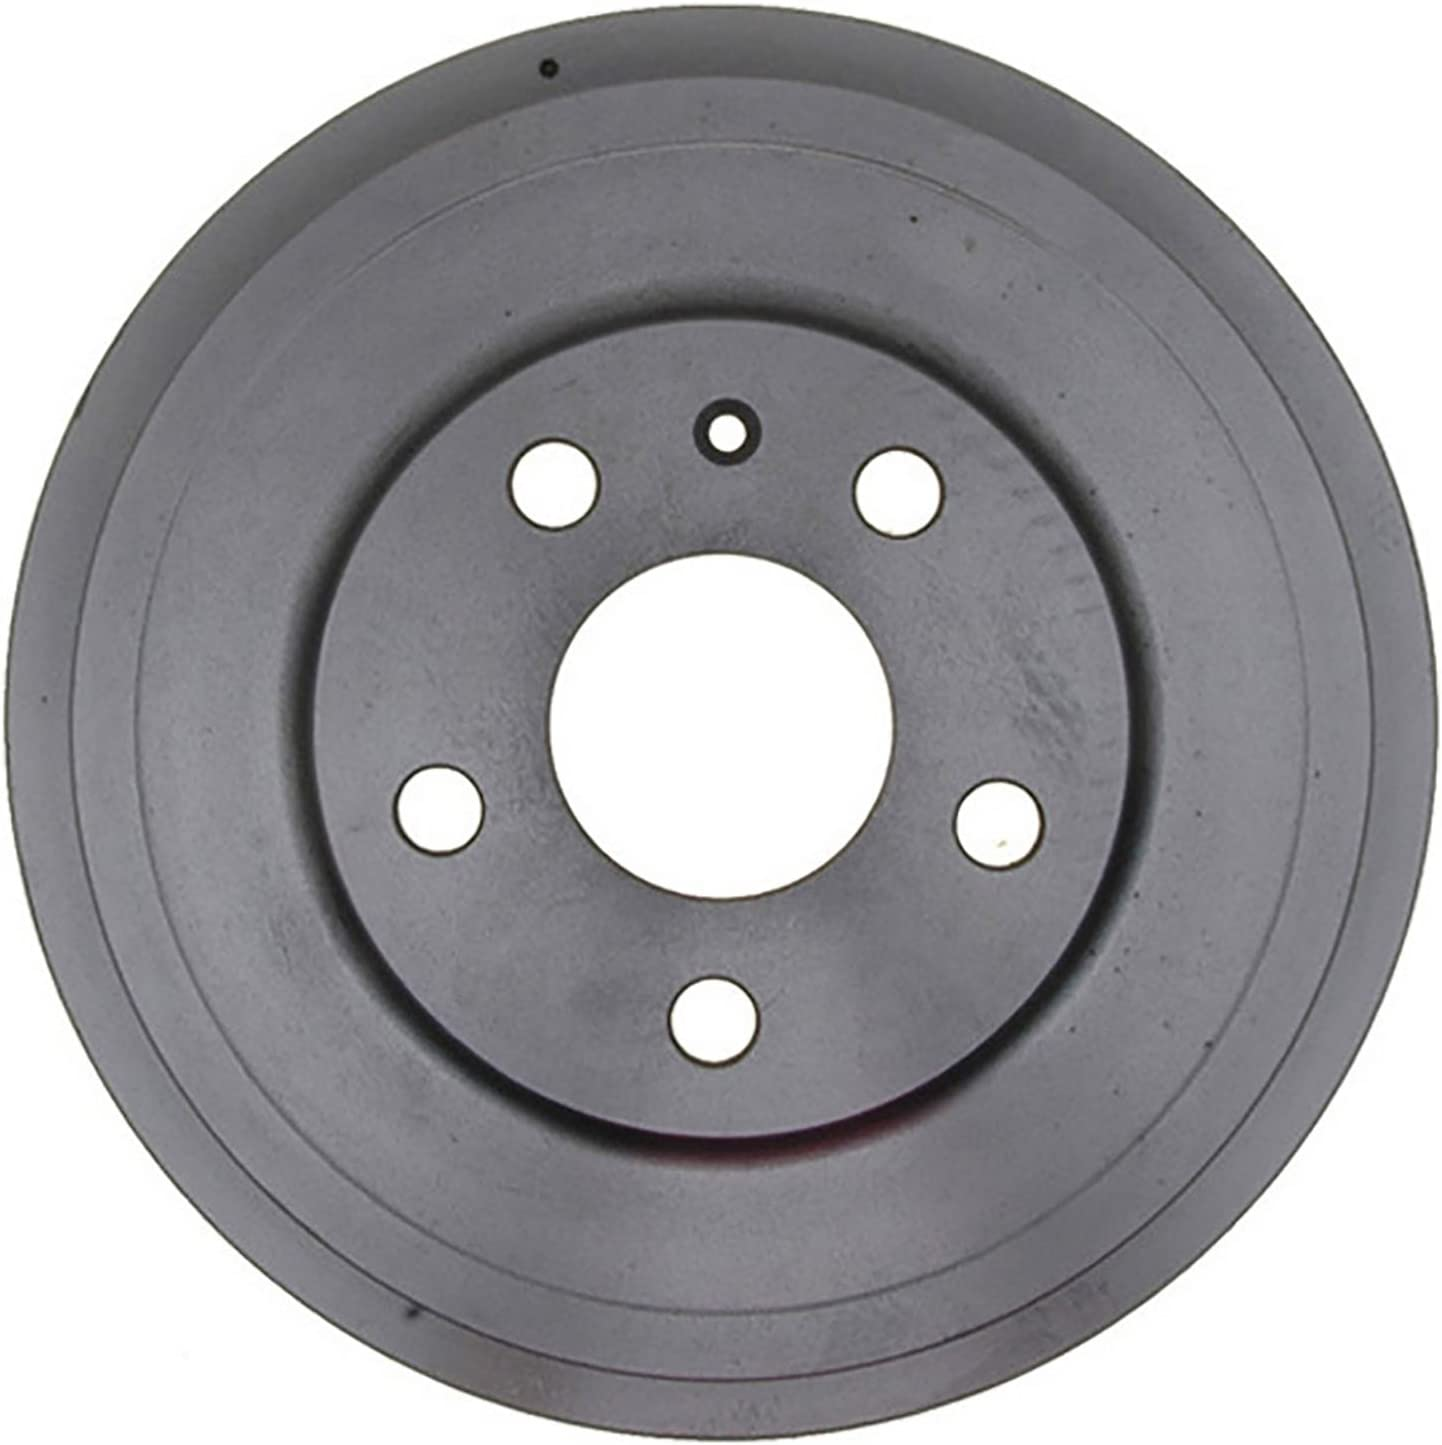 Max 68% OFF ACDelco Advantage wholesale 18B606A Brake Rear Drum